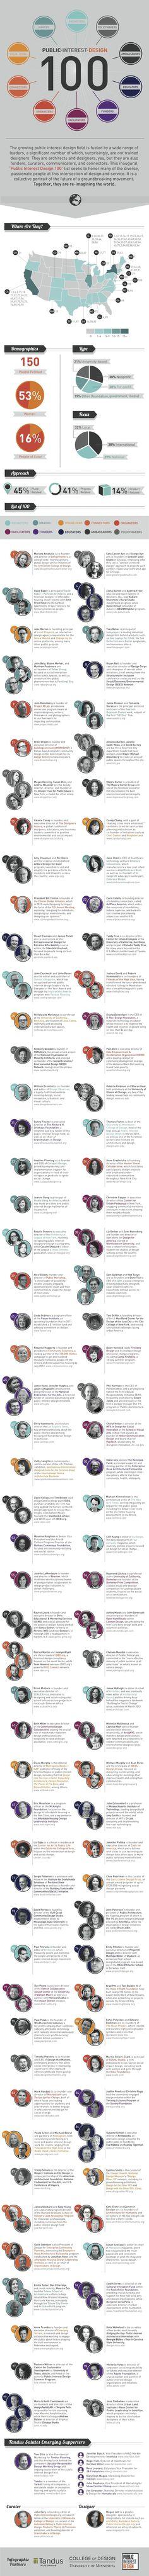 Basically My Heros:   100 People | Public Interest Design